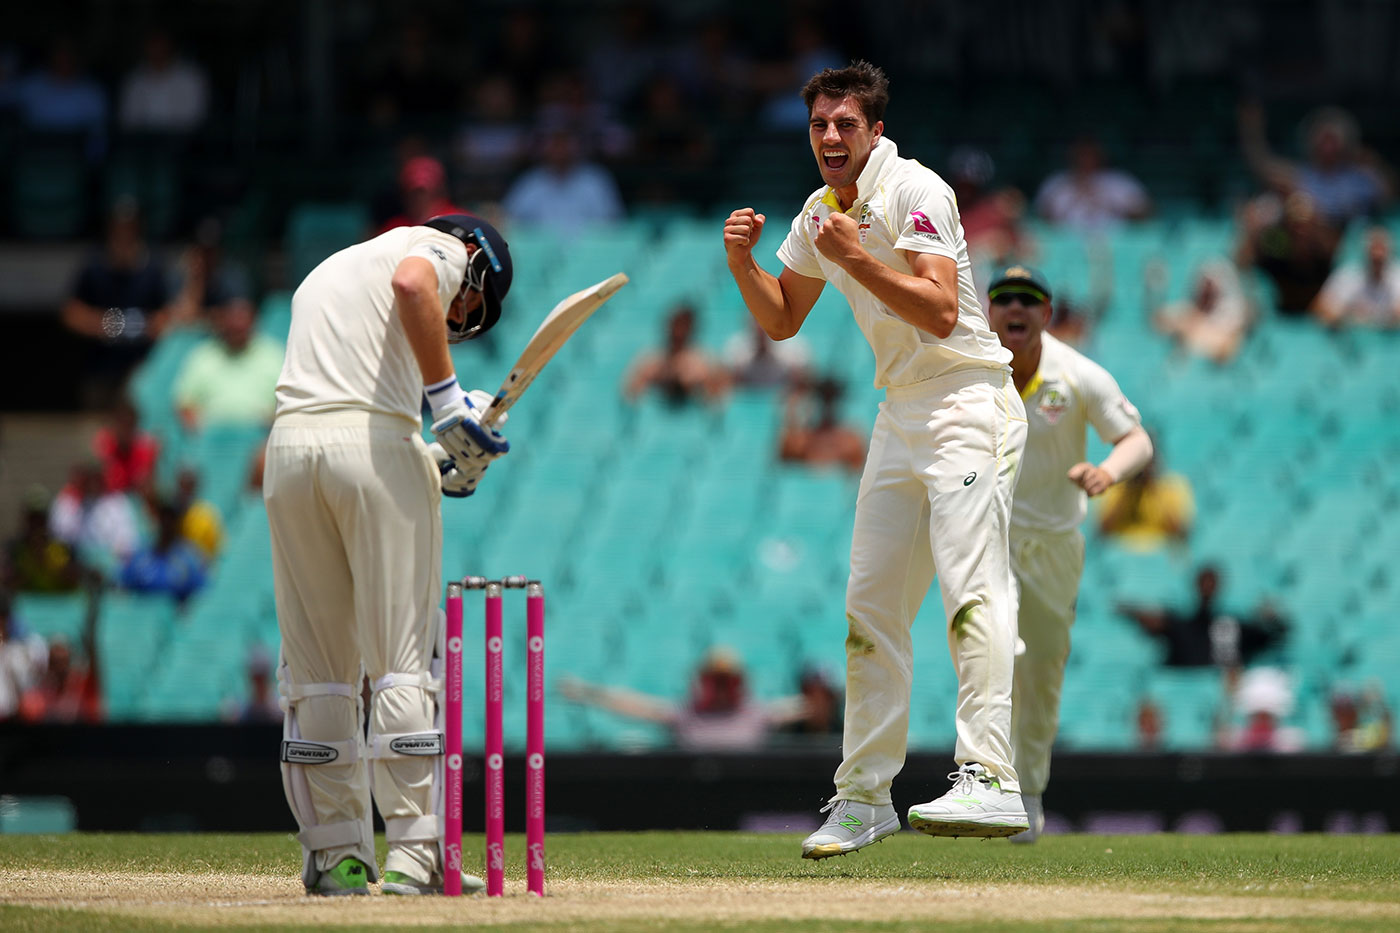 Australia vs England 5th Test Day 5 Highlights